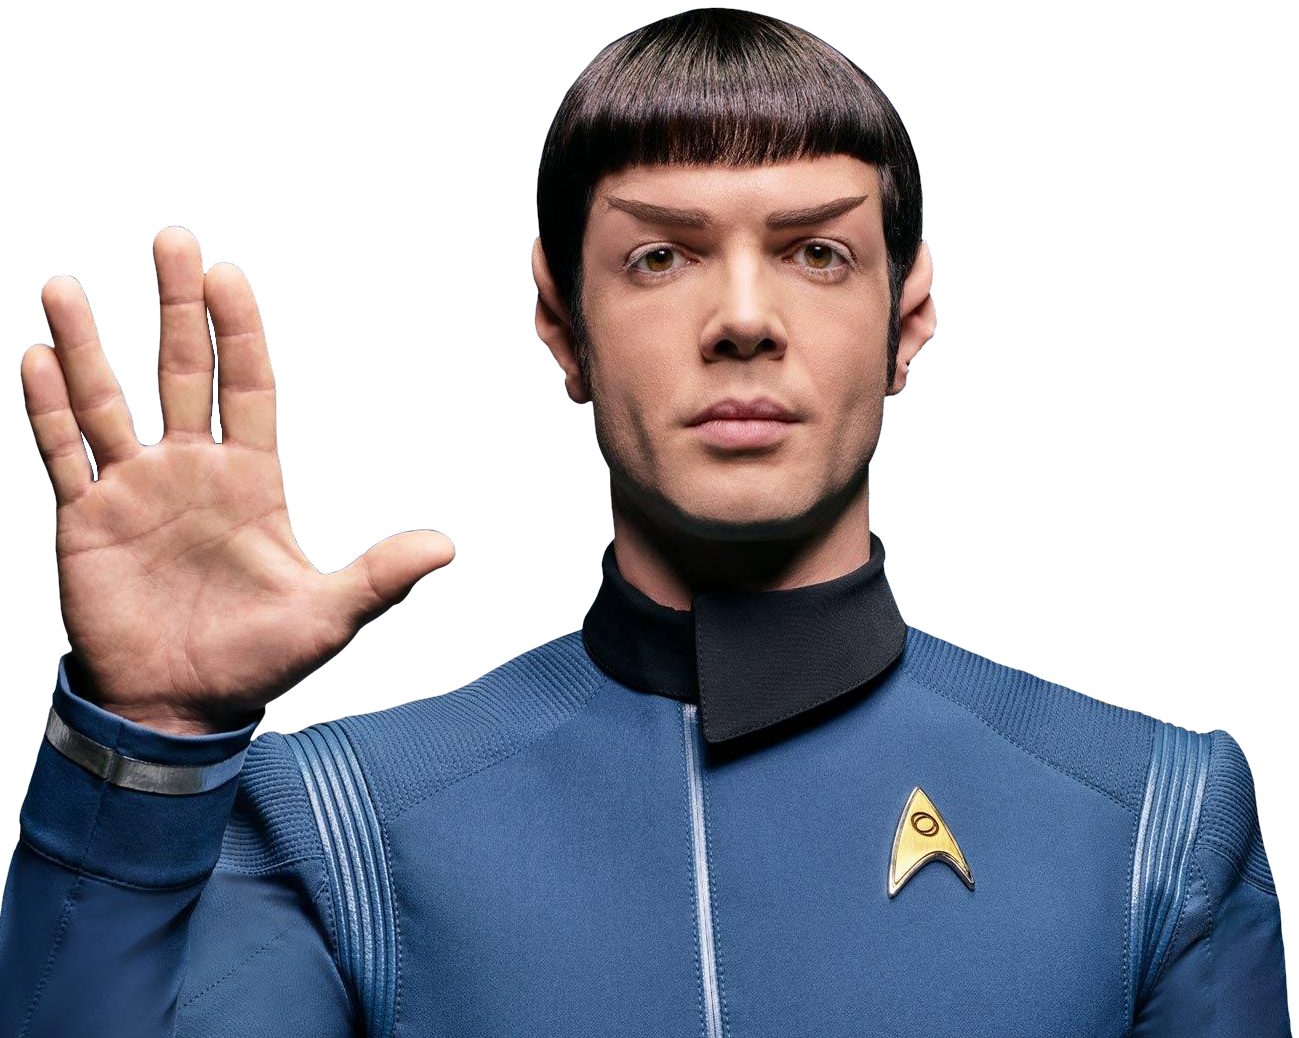 Http Snw Trekcore Com Gallery Albums Promo Photos Cast Spock S0 Spock Blueshirt Png Star Trek Series Star Trek Characters Star Trek Movies